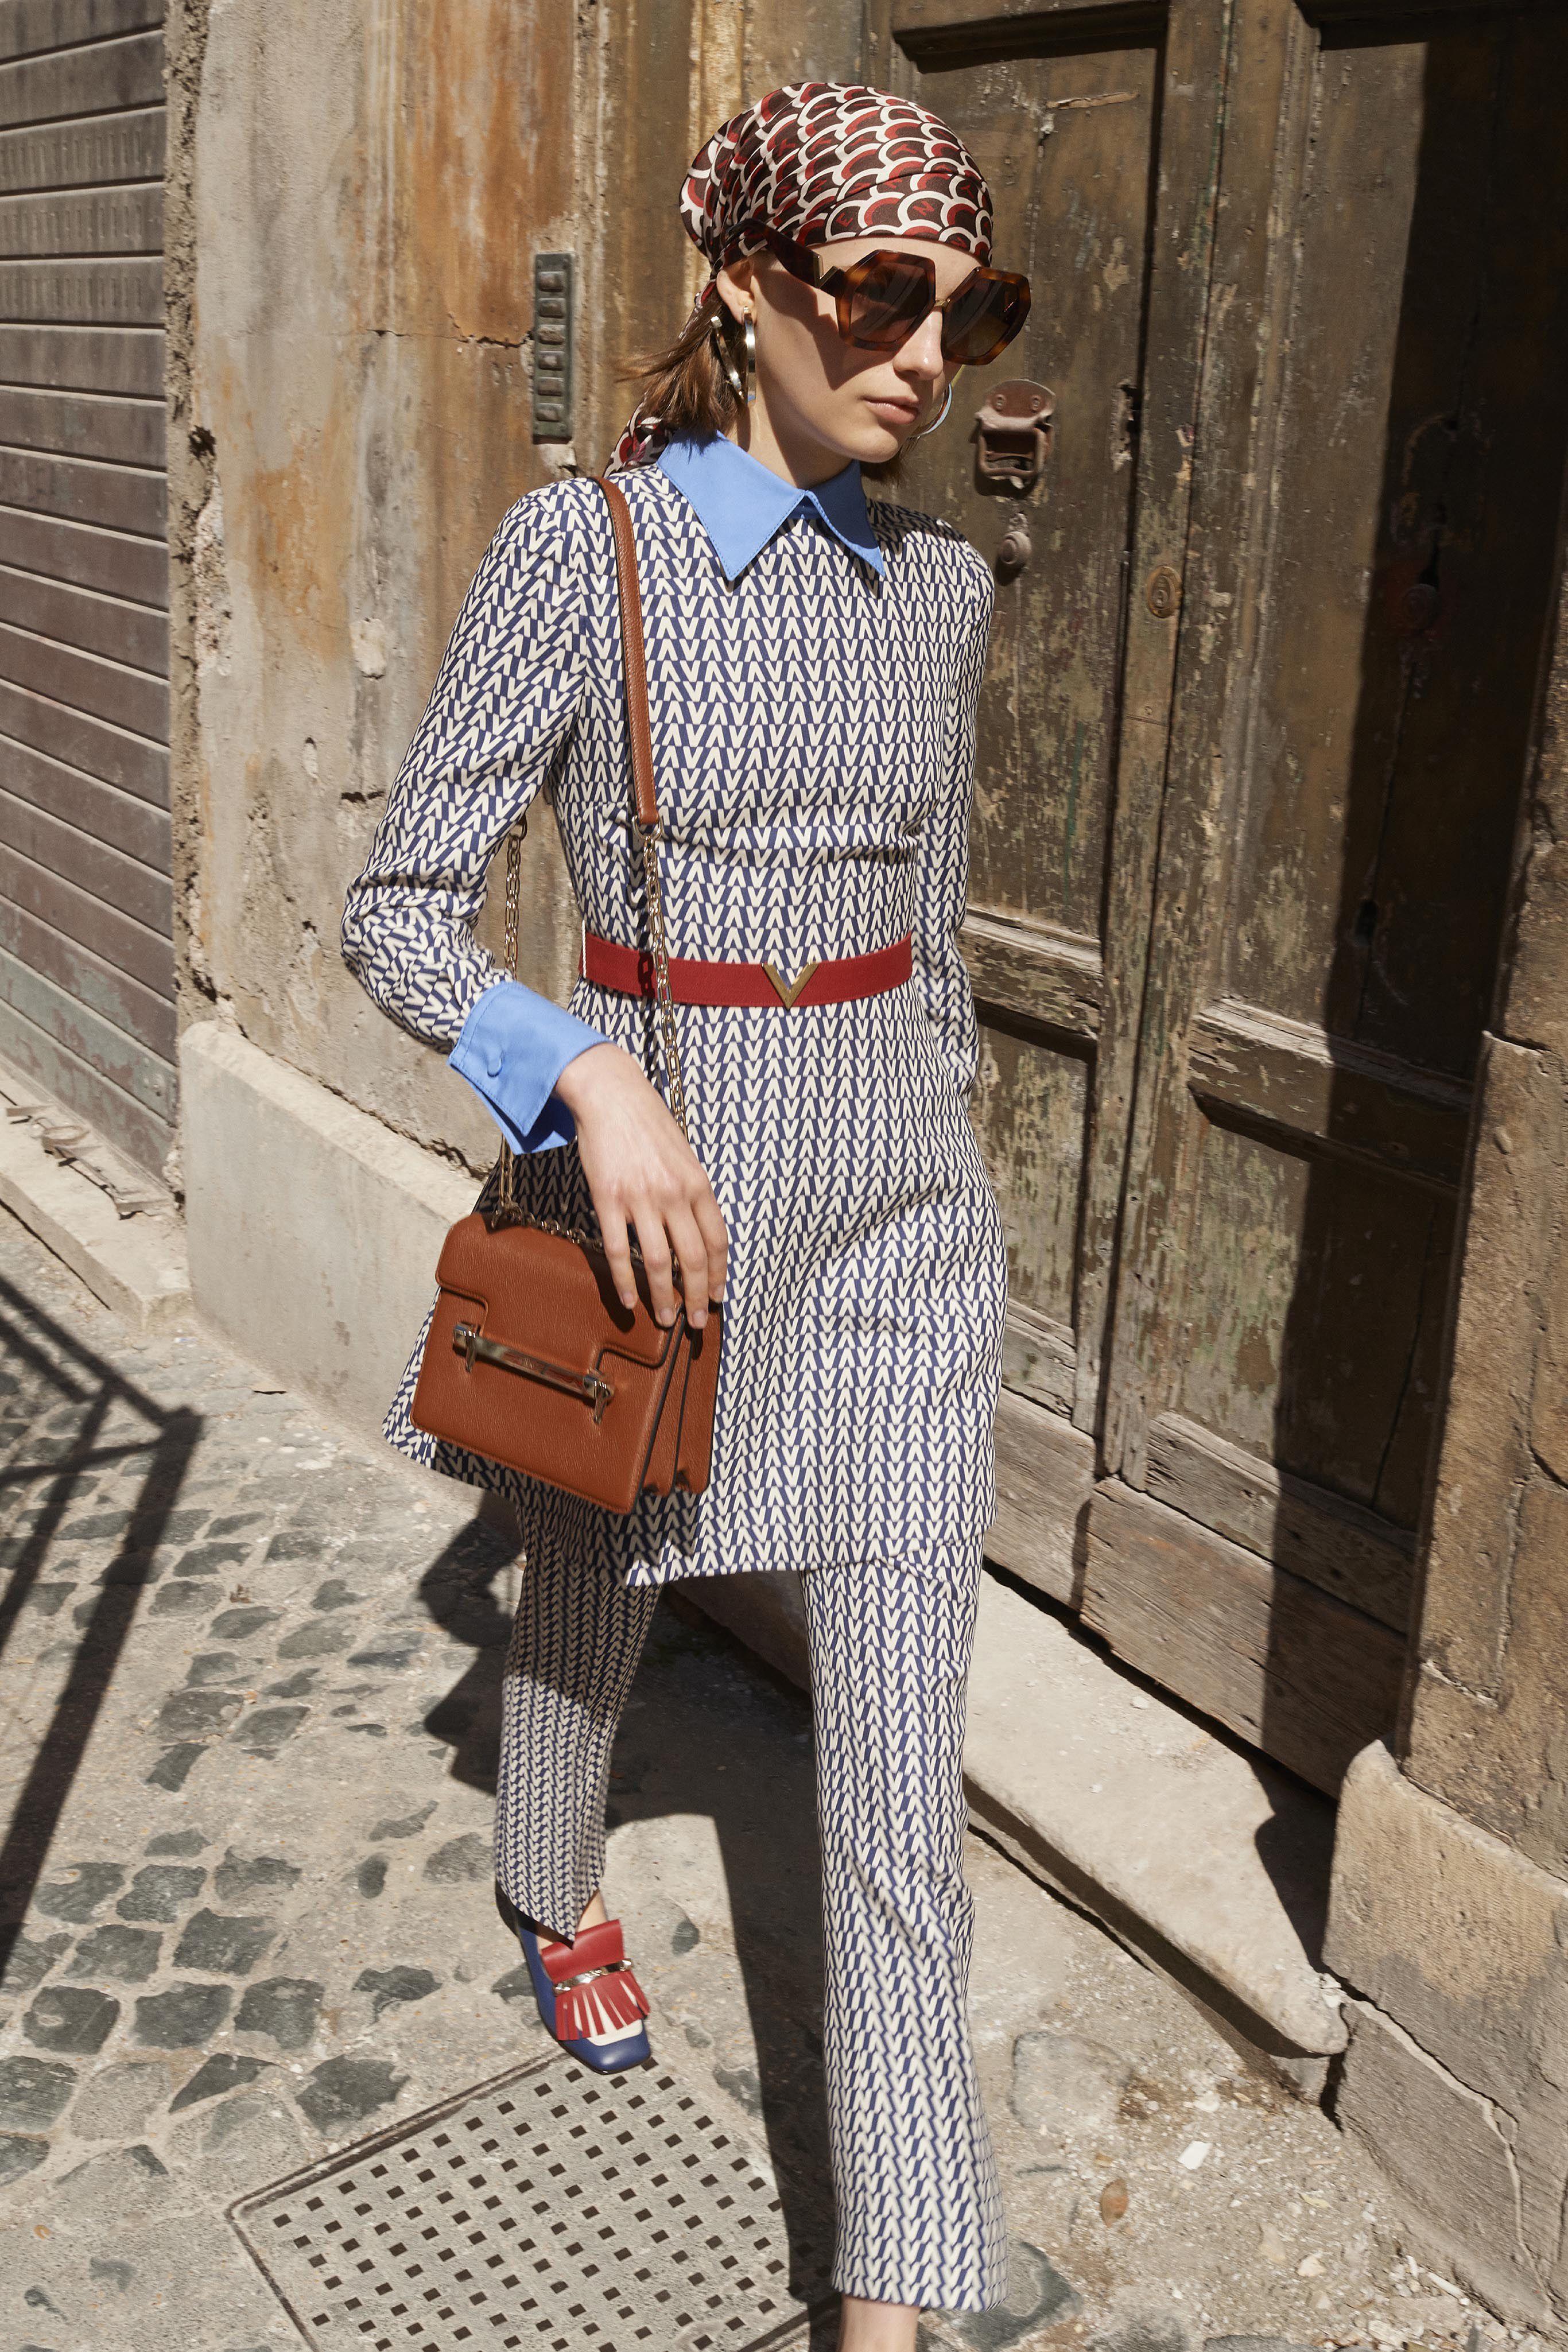 bc7c2718dfe Valentino Resort 2019 Fashion Show Collection  See the complete Valentino  Resort 2019 collection. Look 34